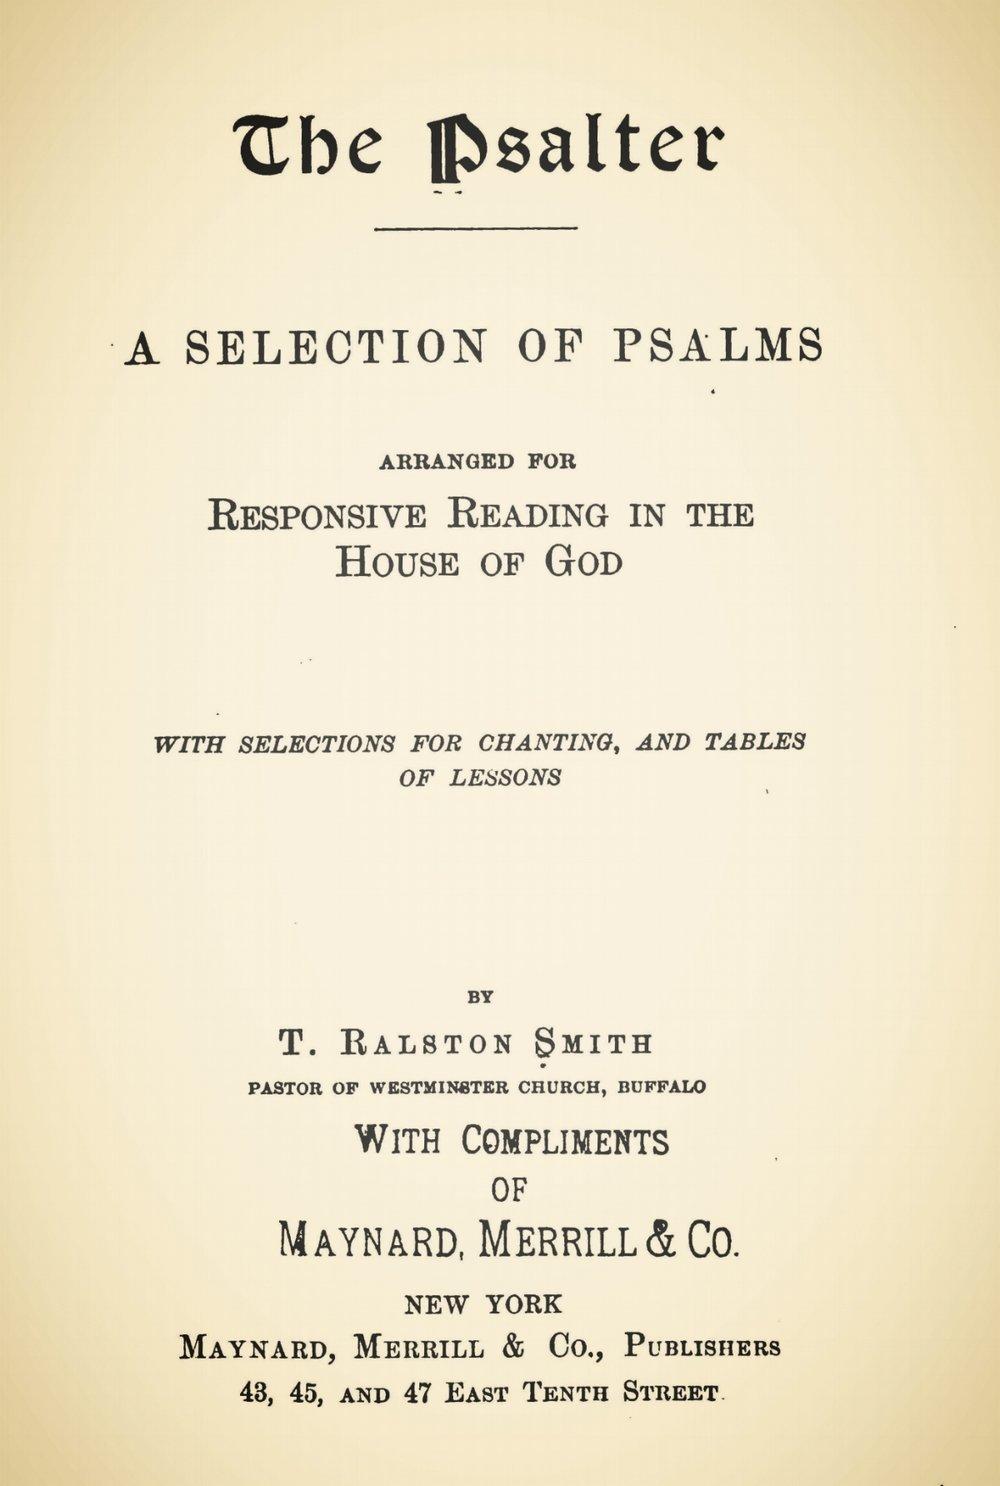 Smith, Thomas Ralston, The Psalter Title Page.jpg